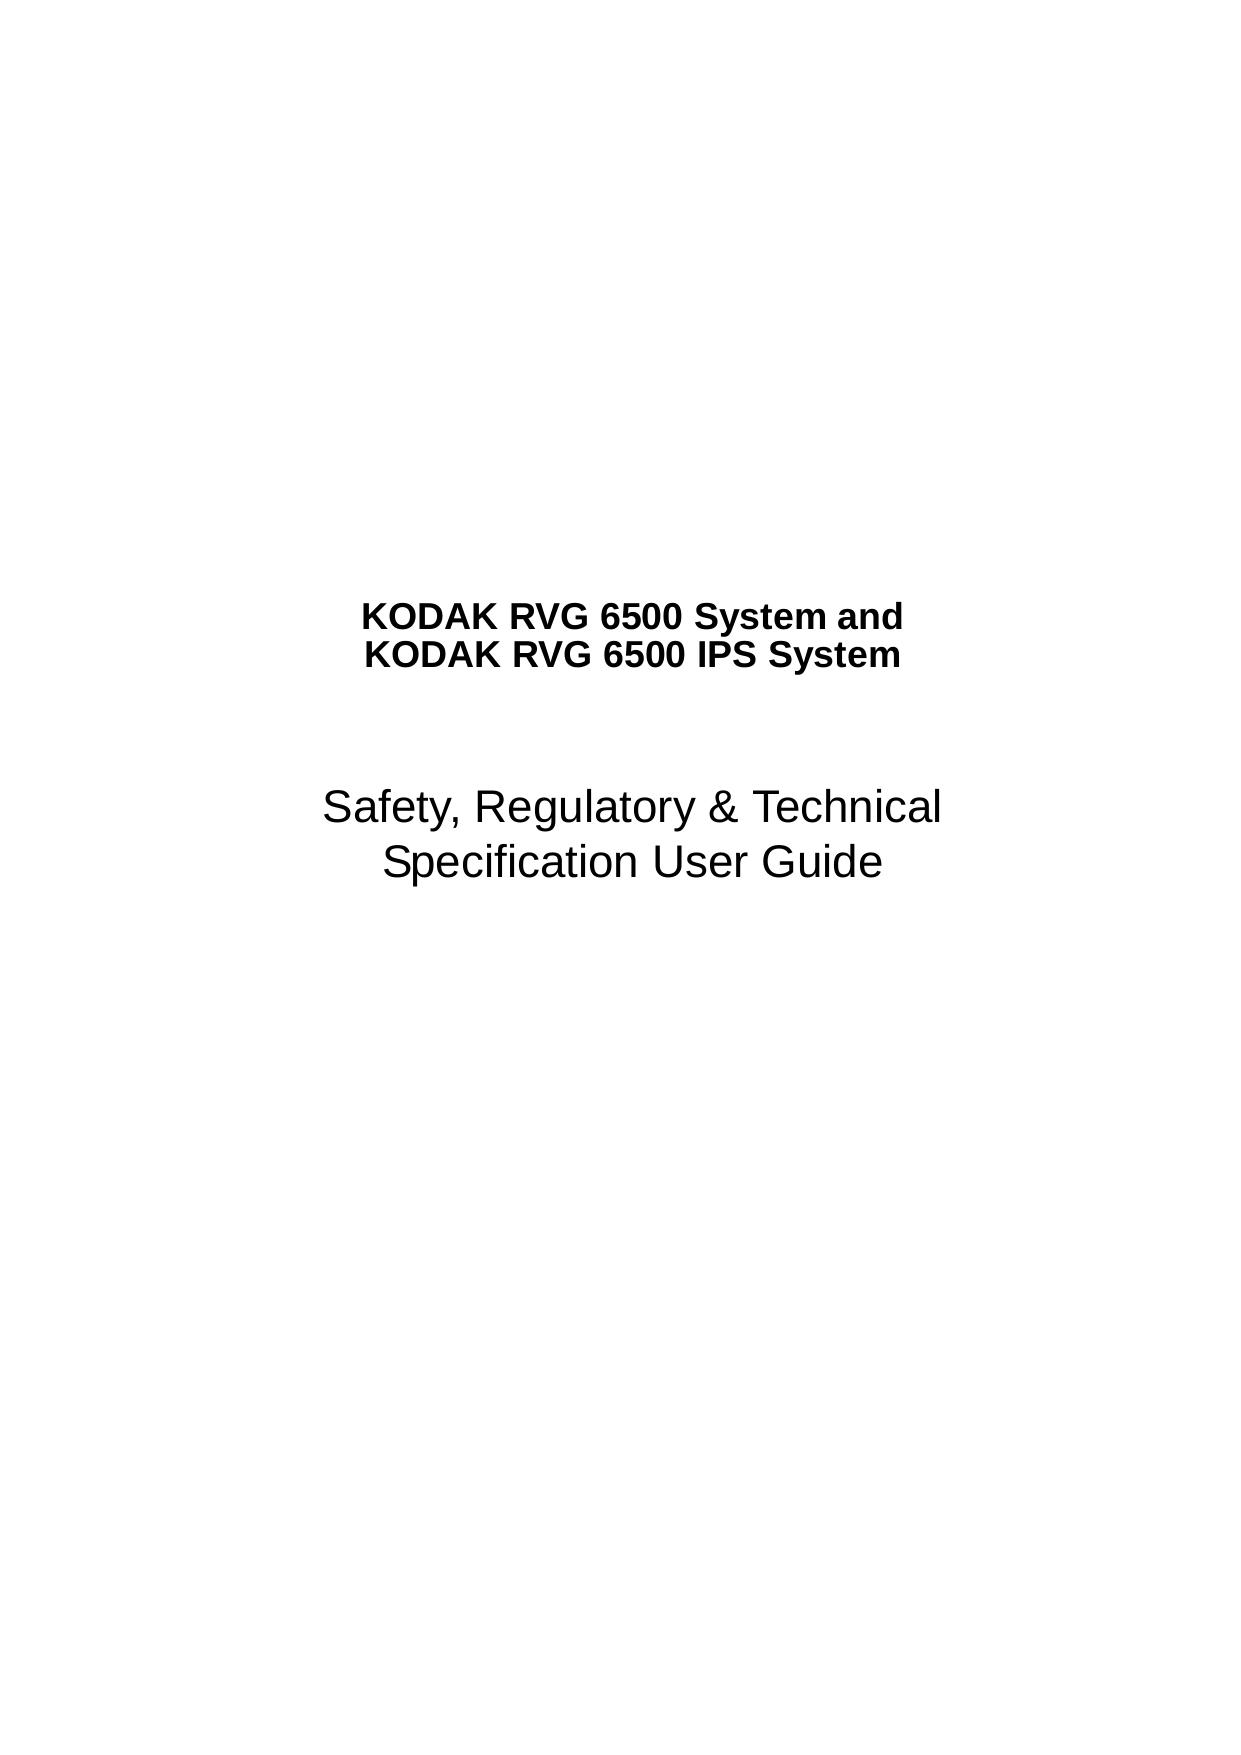 Kodak 6800 Service Manual Hp Laserjet 9000mfp Flatbed Scanner Assembly Parts Diagram 3 Of Mfc9840cdwservice Man Array Carestream Health Rvg00001 Wifi Control Box User Sm737 Rh Usermanual Wiki